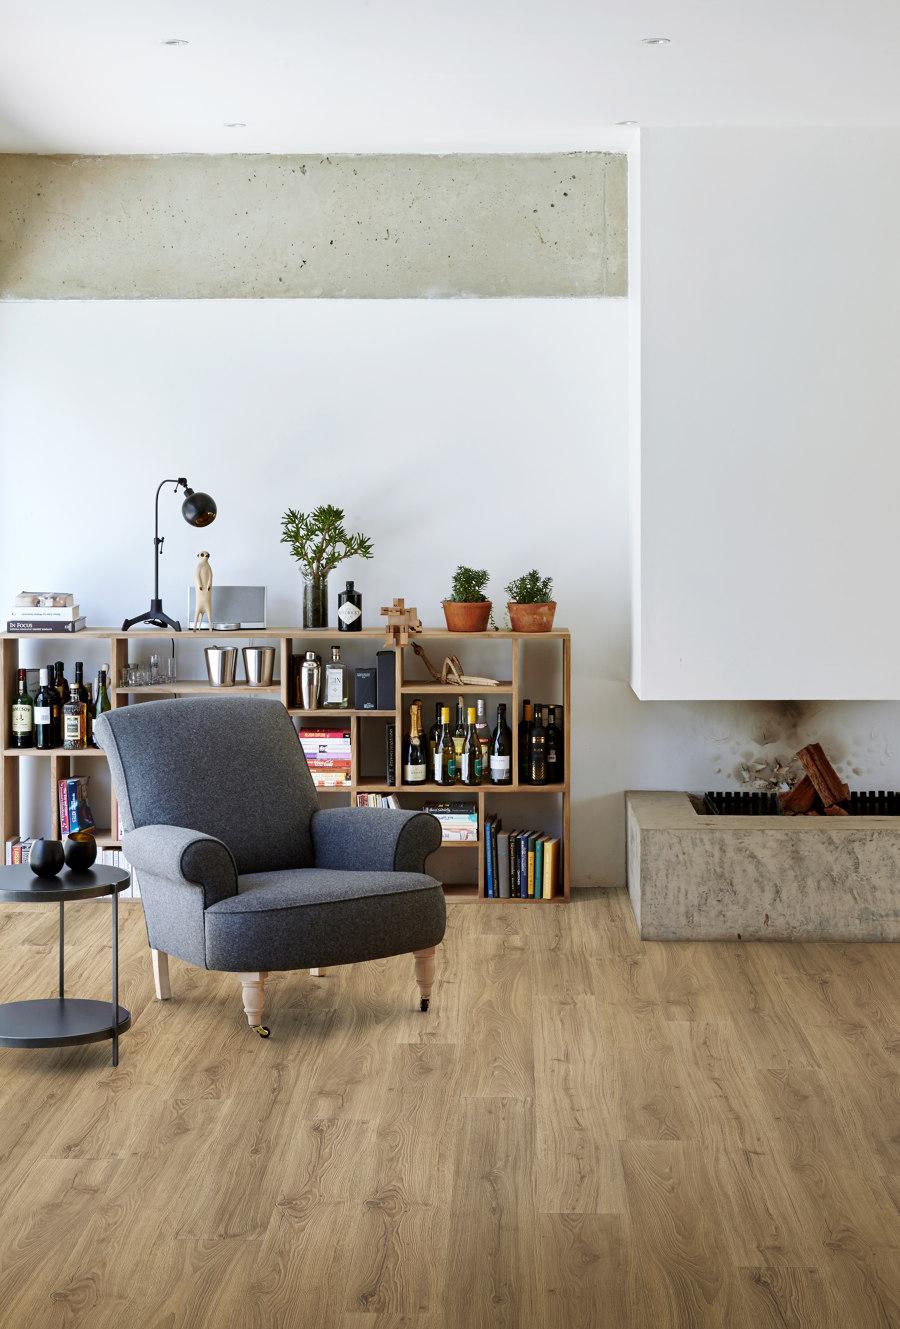 The floors of nature: Kährs   News